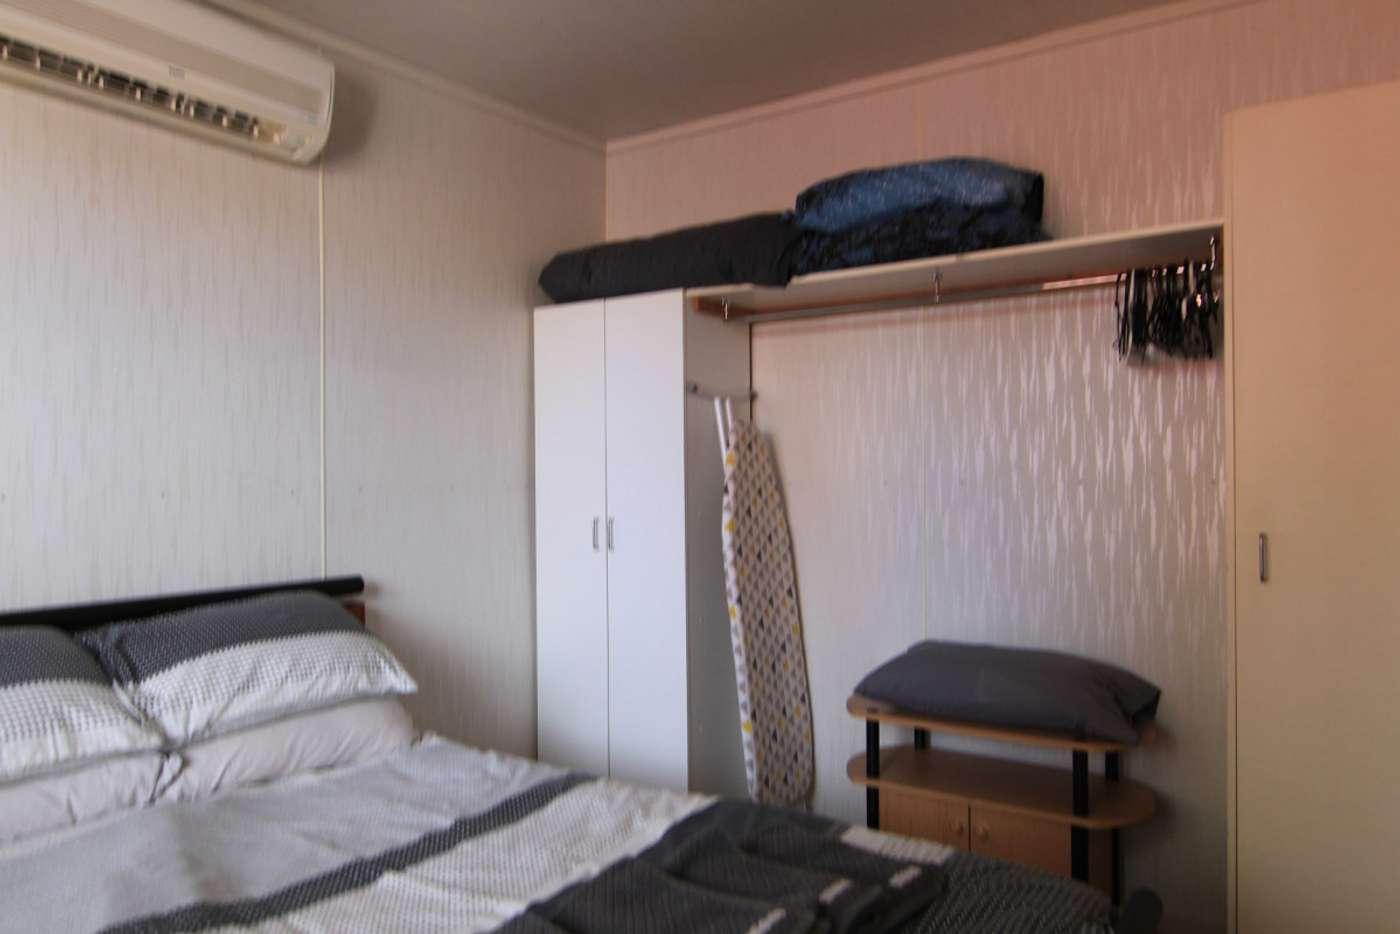 Seventh view of Homely house listing, 14 Mango Street, Kununurra WA 6743